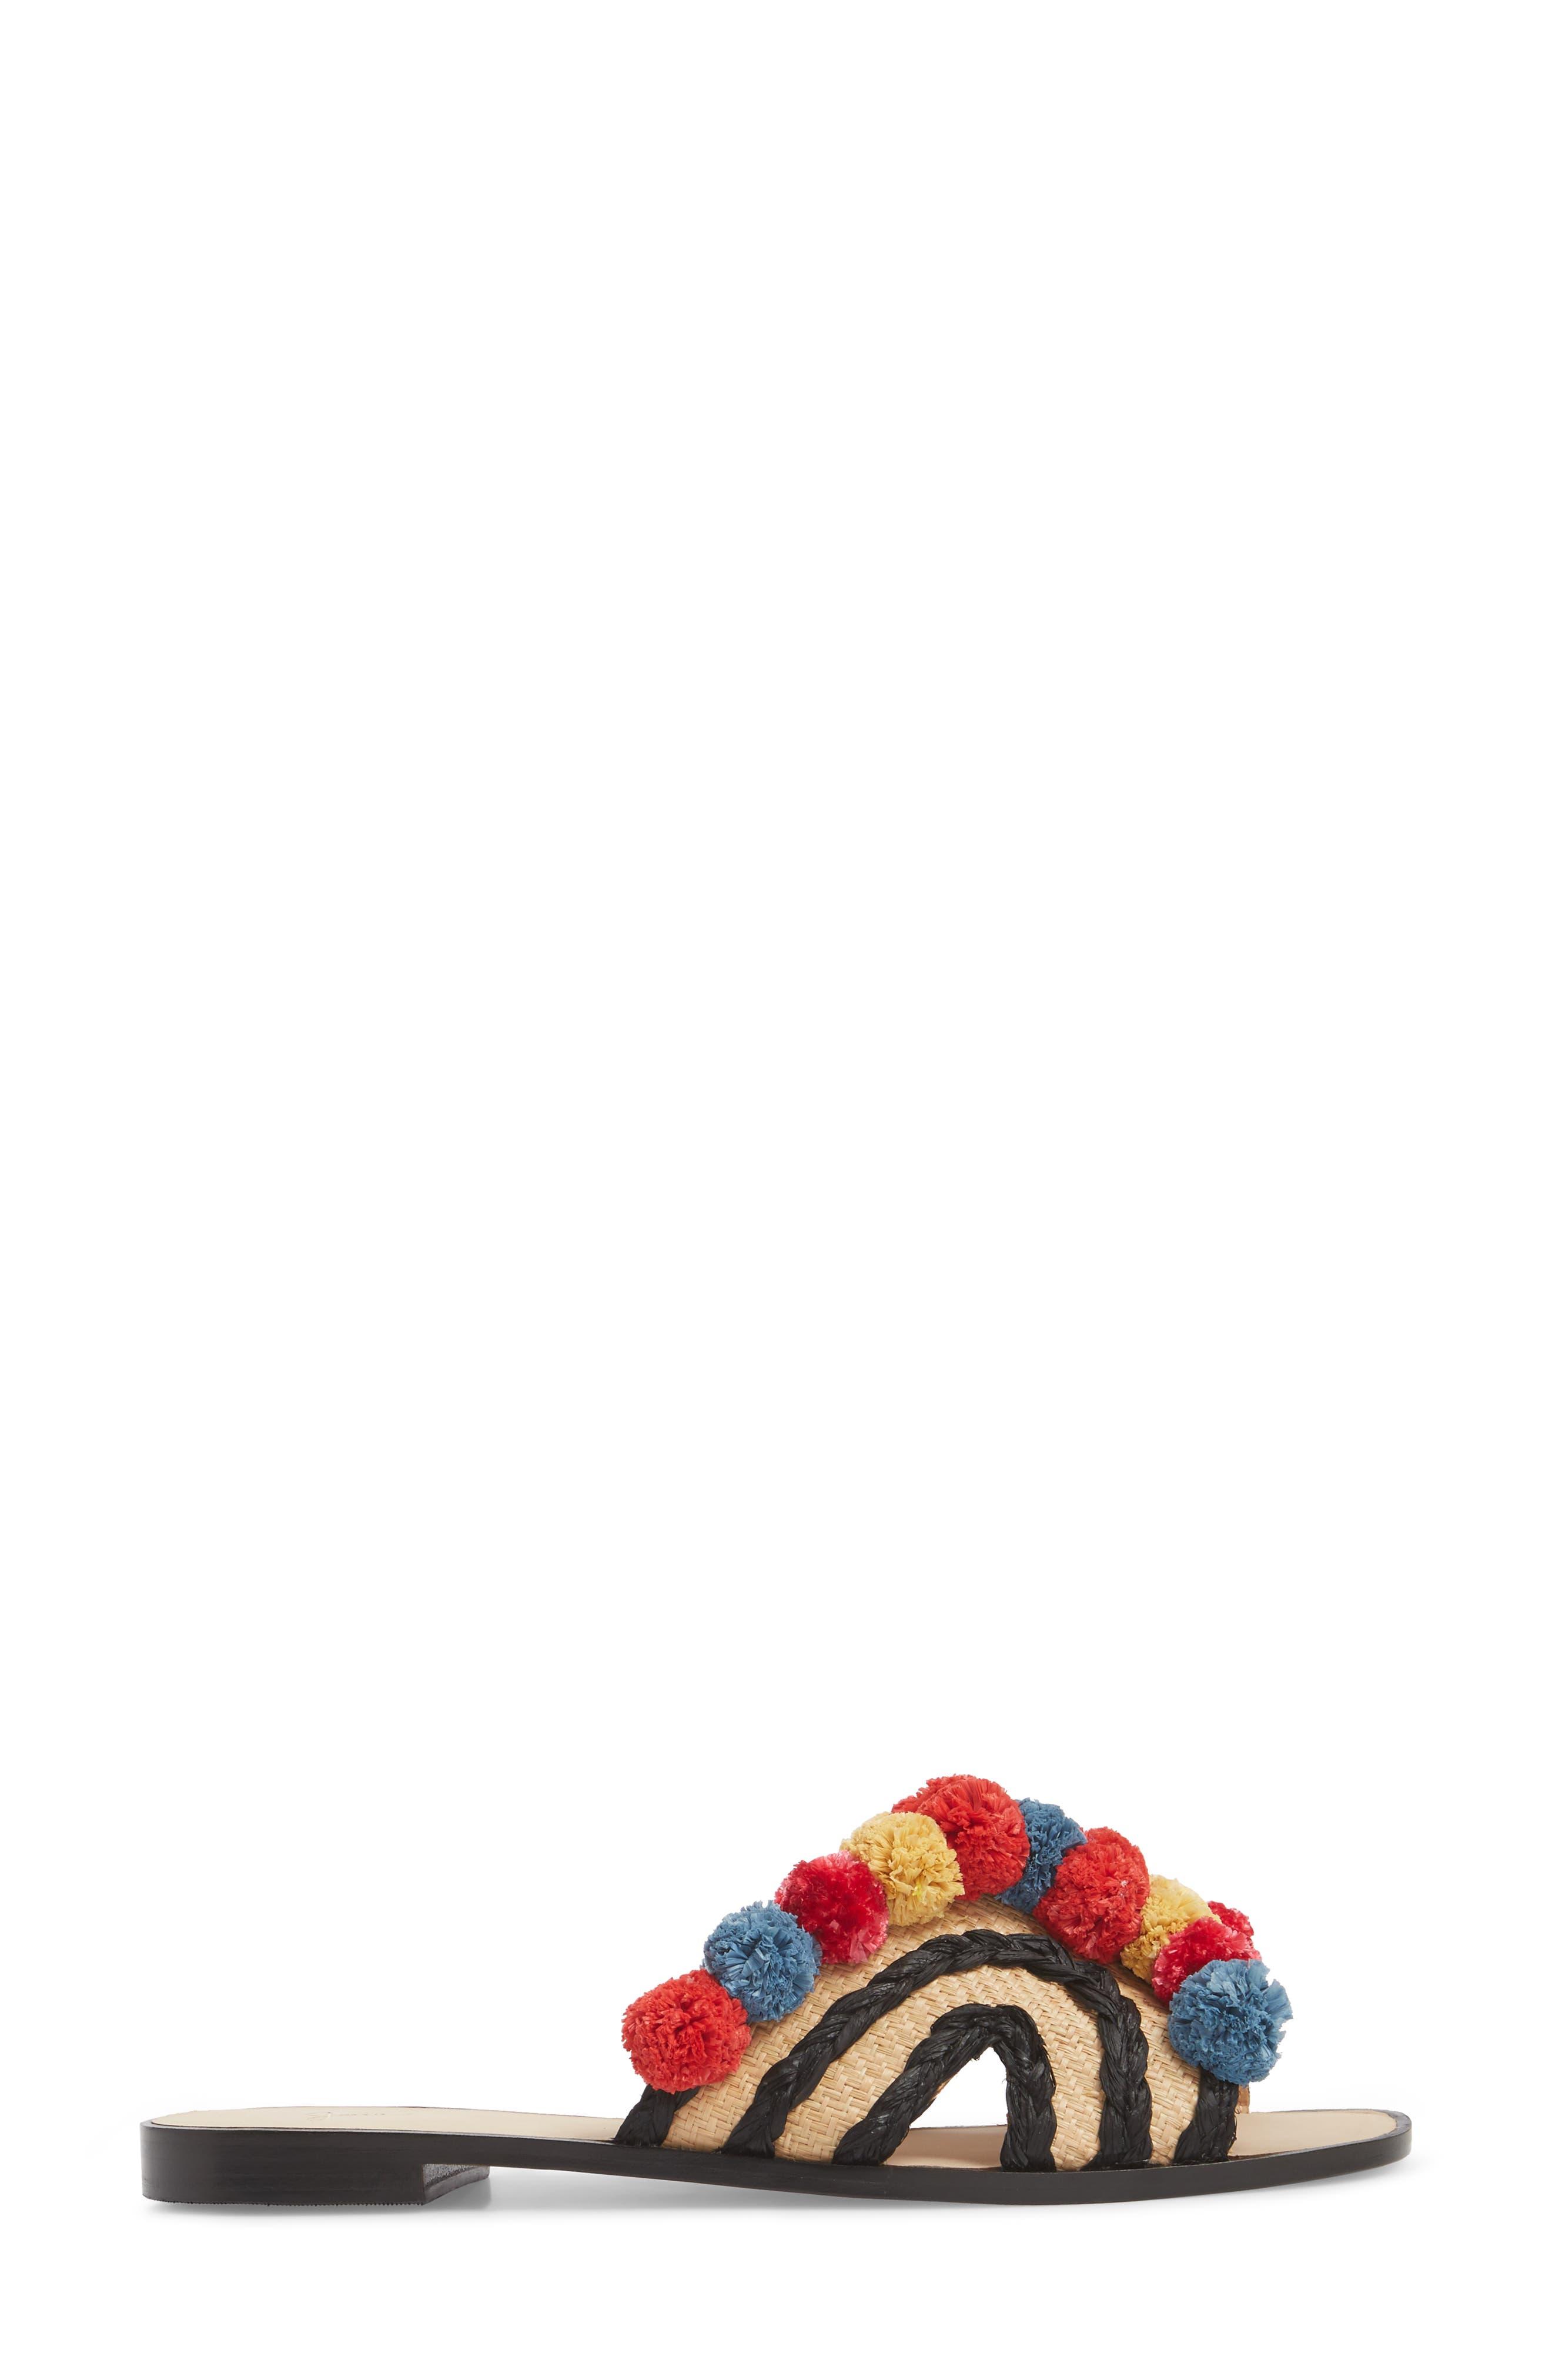 Paden Pompom Slide Sandals,                             Alternate thumbnail 3, color,                             Multi